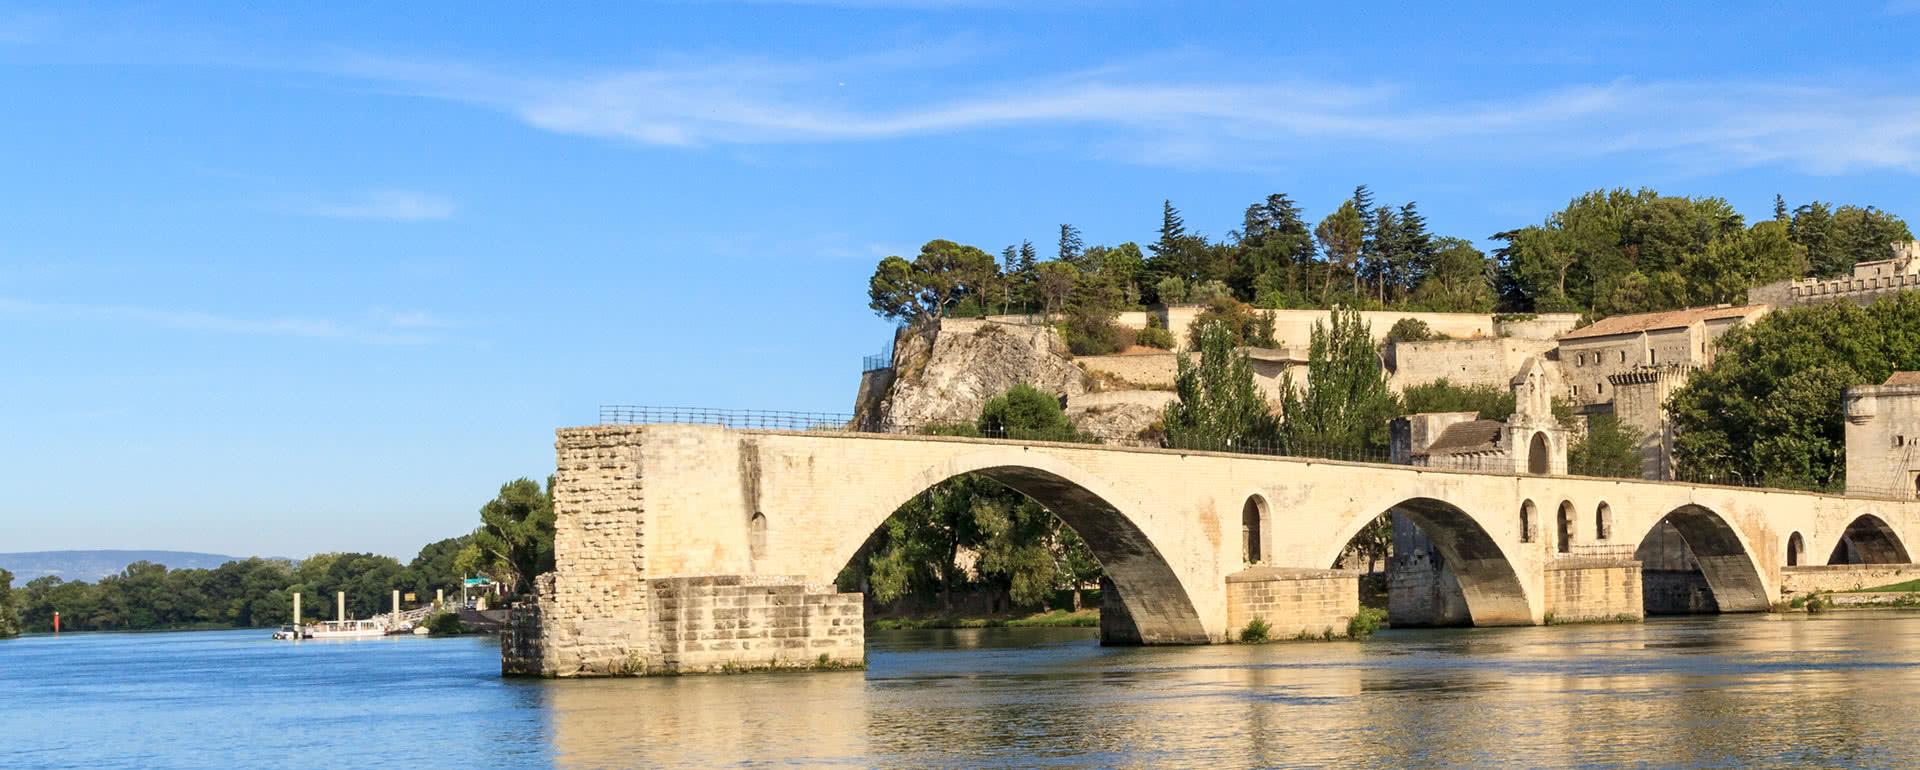 Titelbild von Avignon